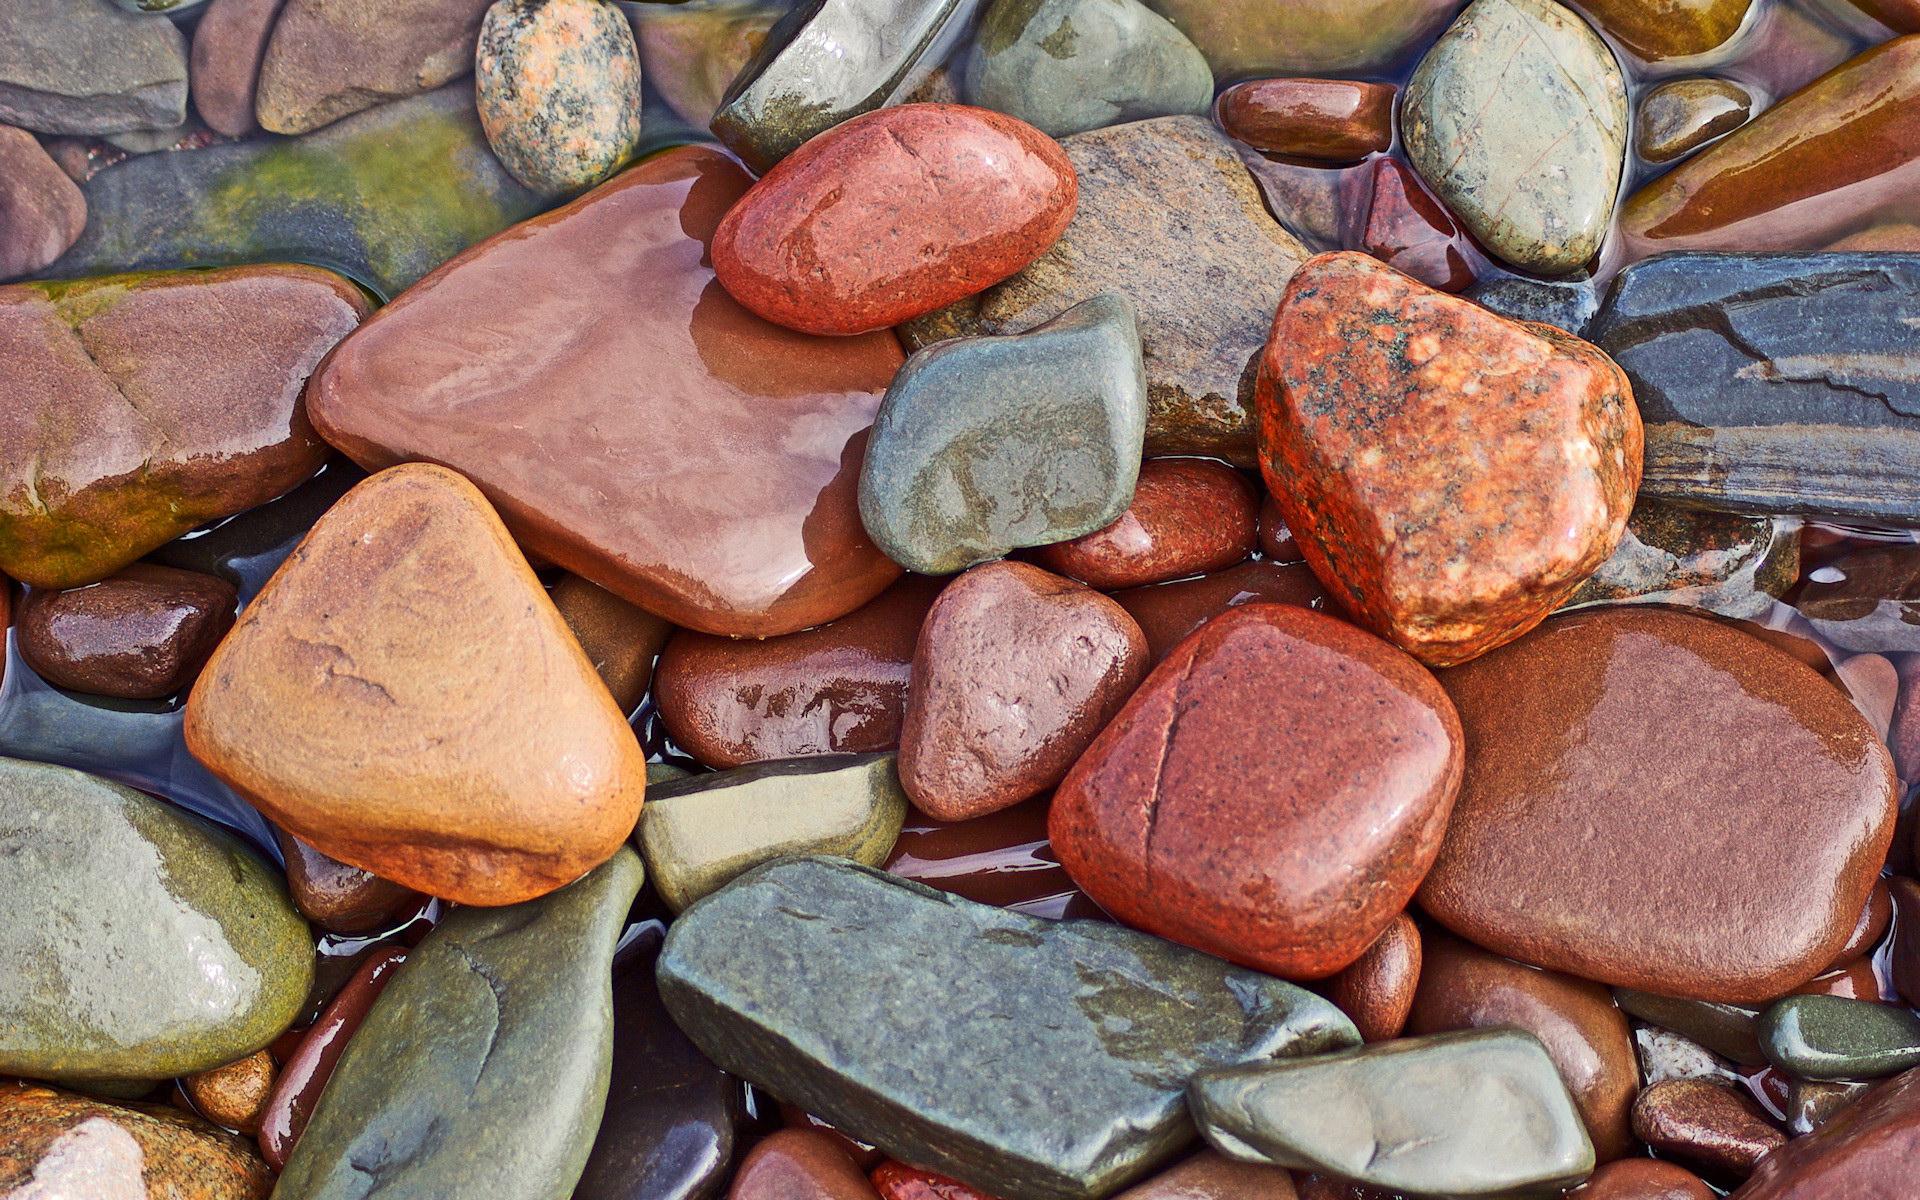 Sea stones Desktop Wallpapers FREE on Latorocom 1920x1200